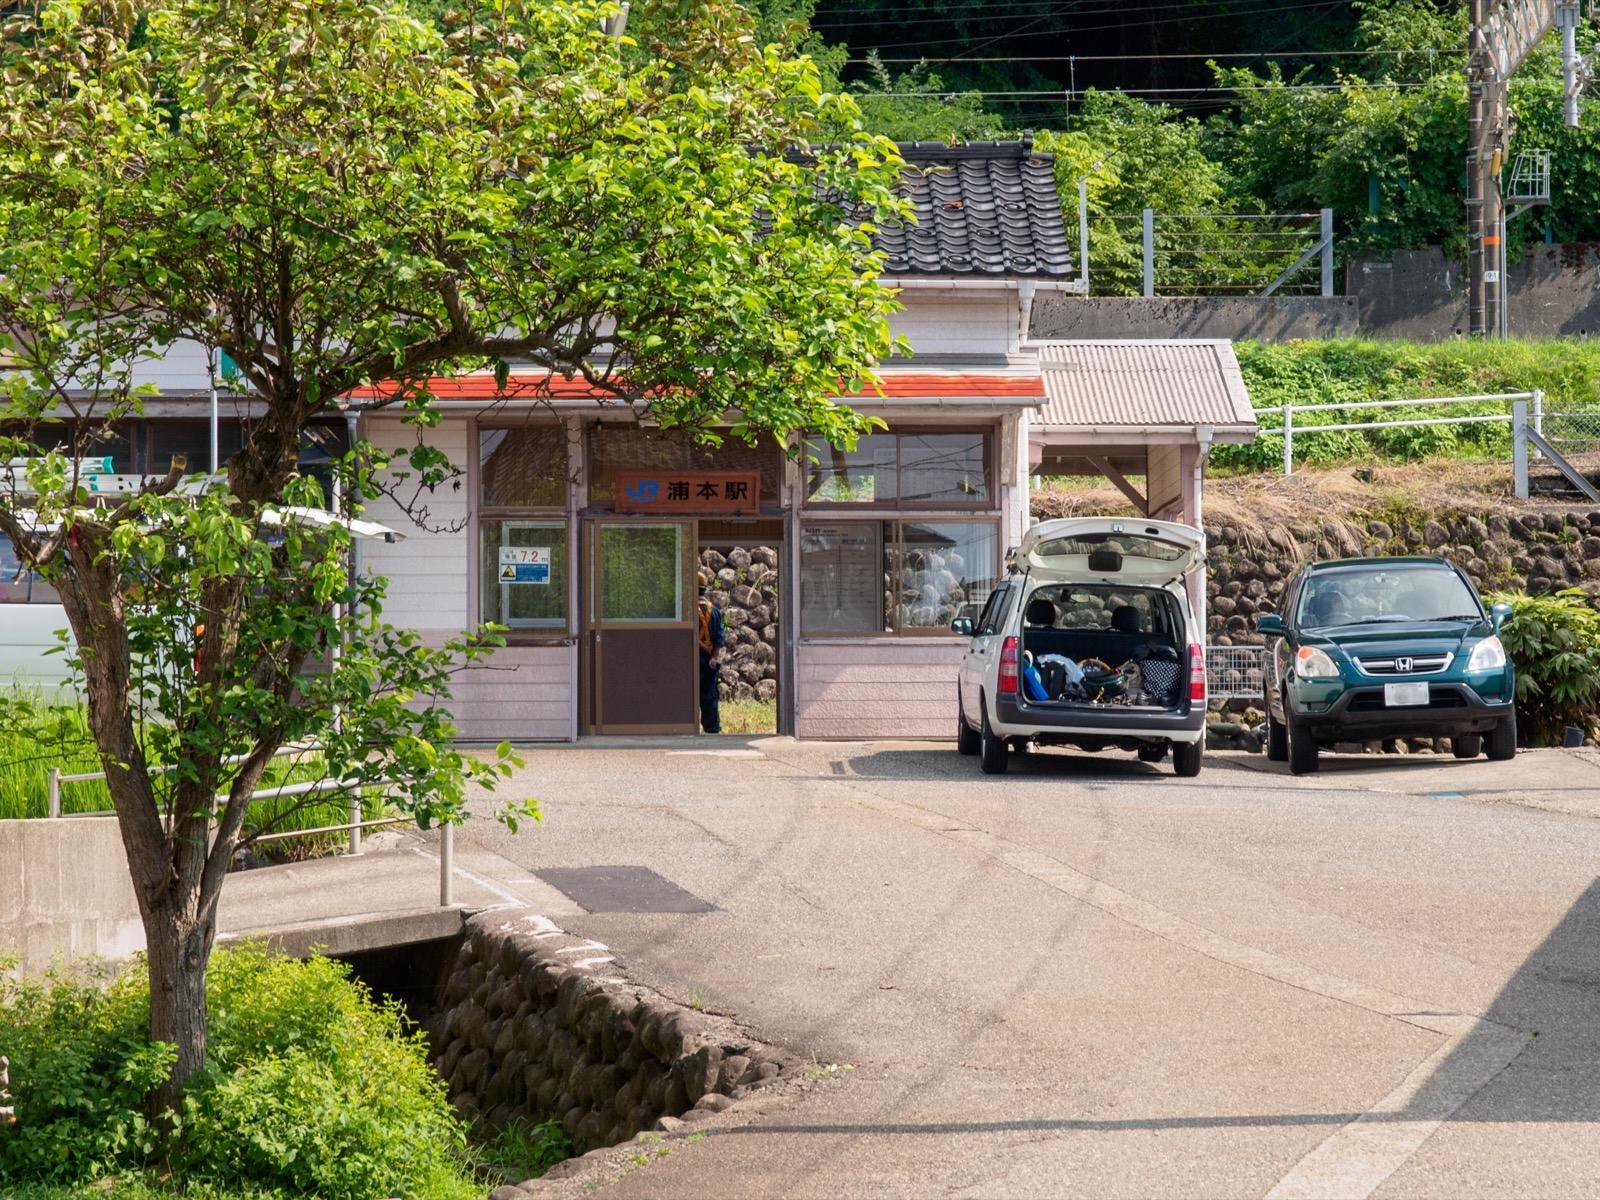 浦本駅の木造駅舎